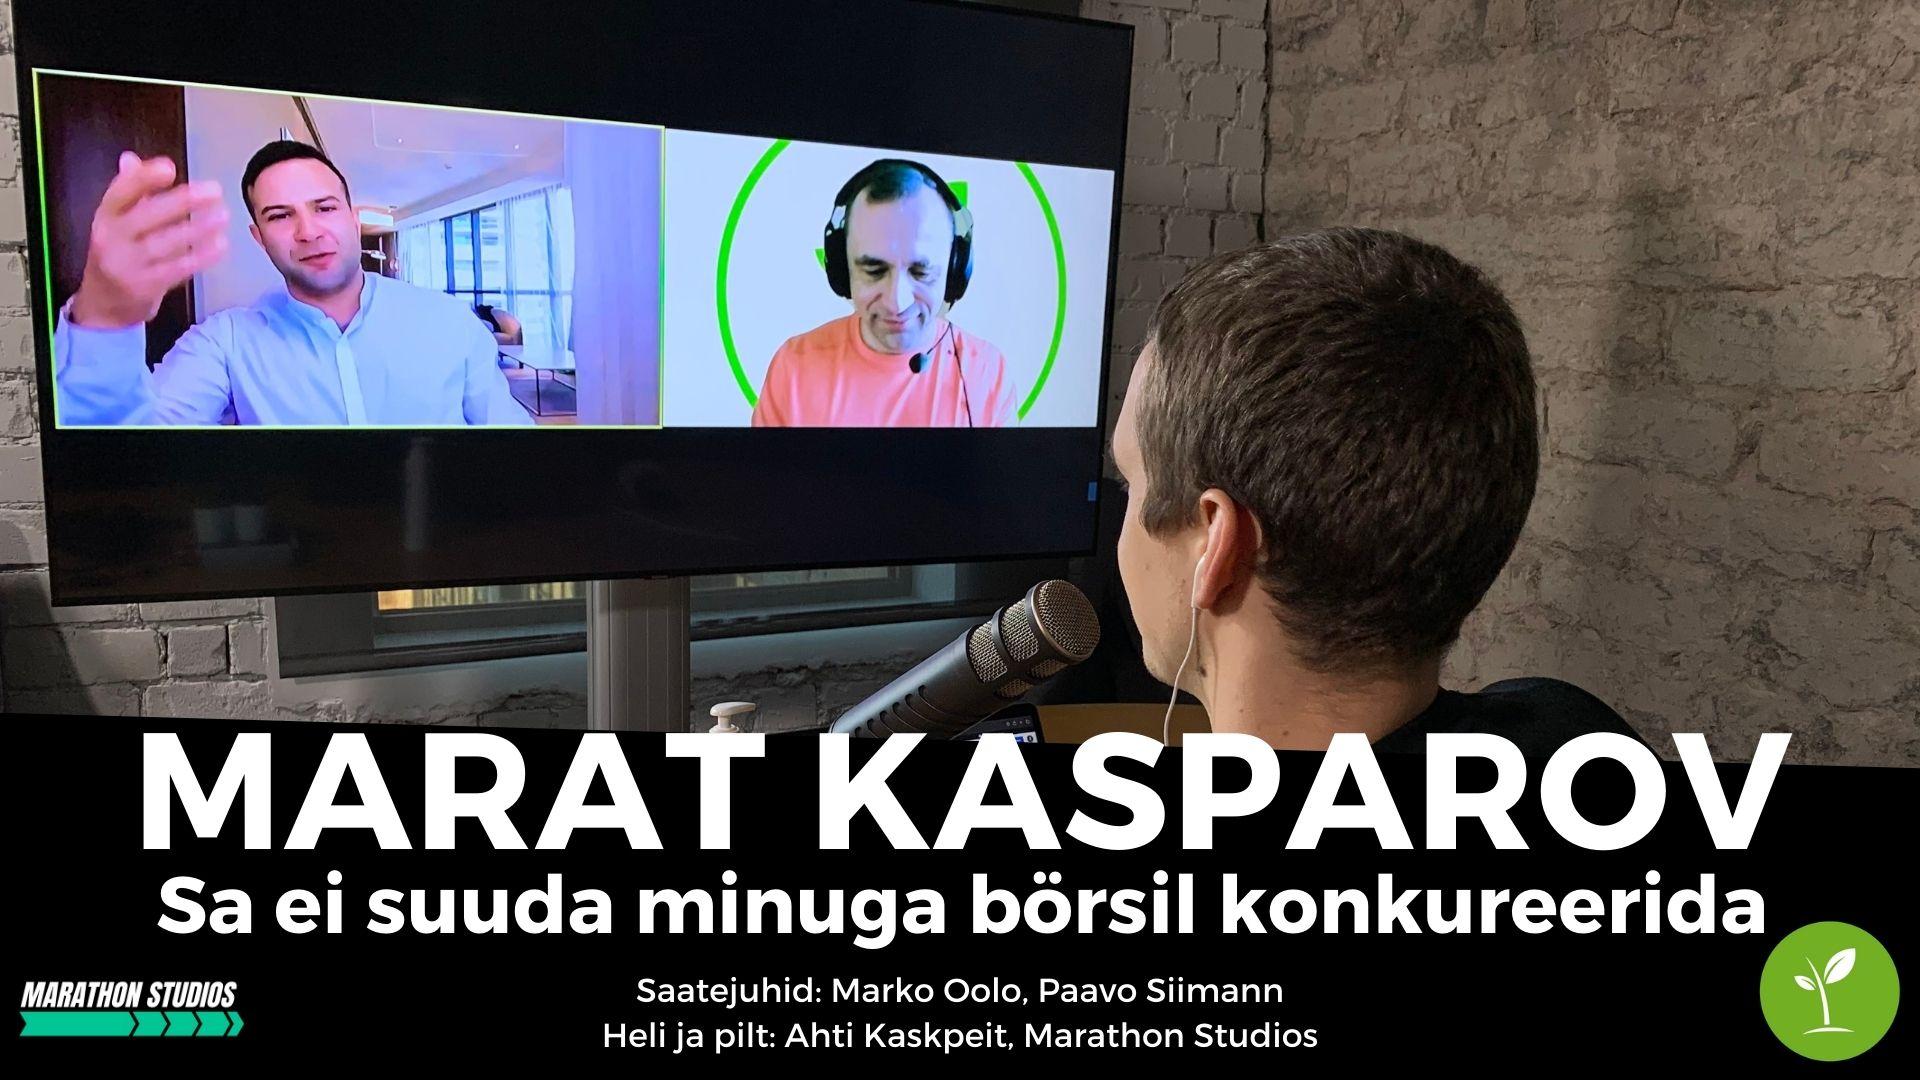 Marat Kasparov